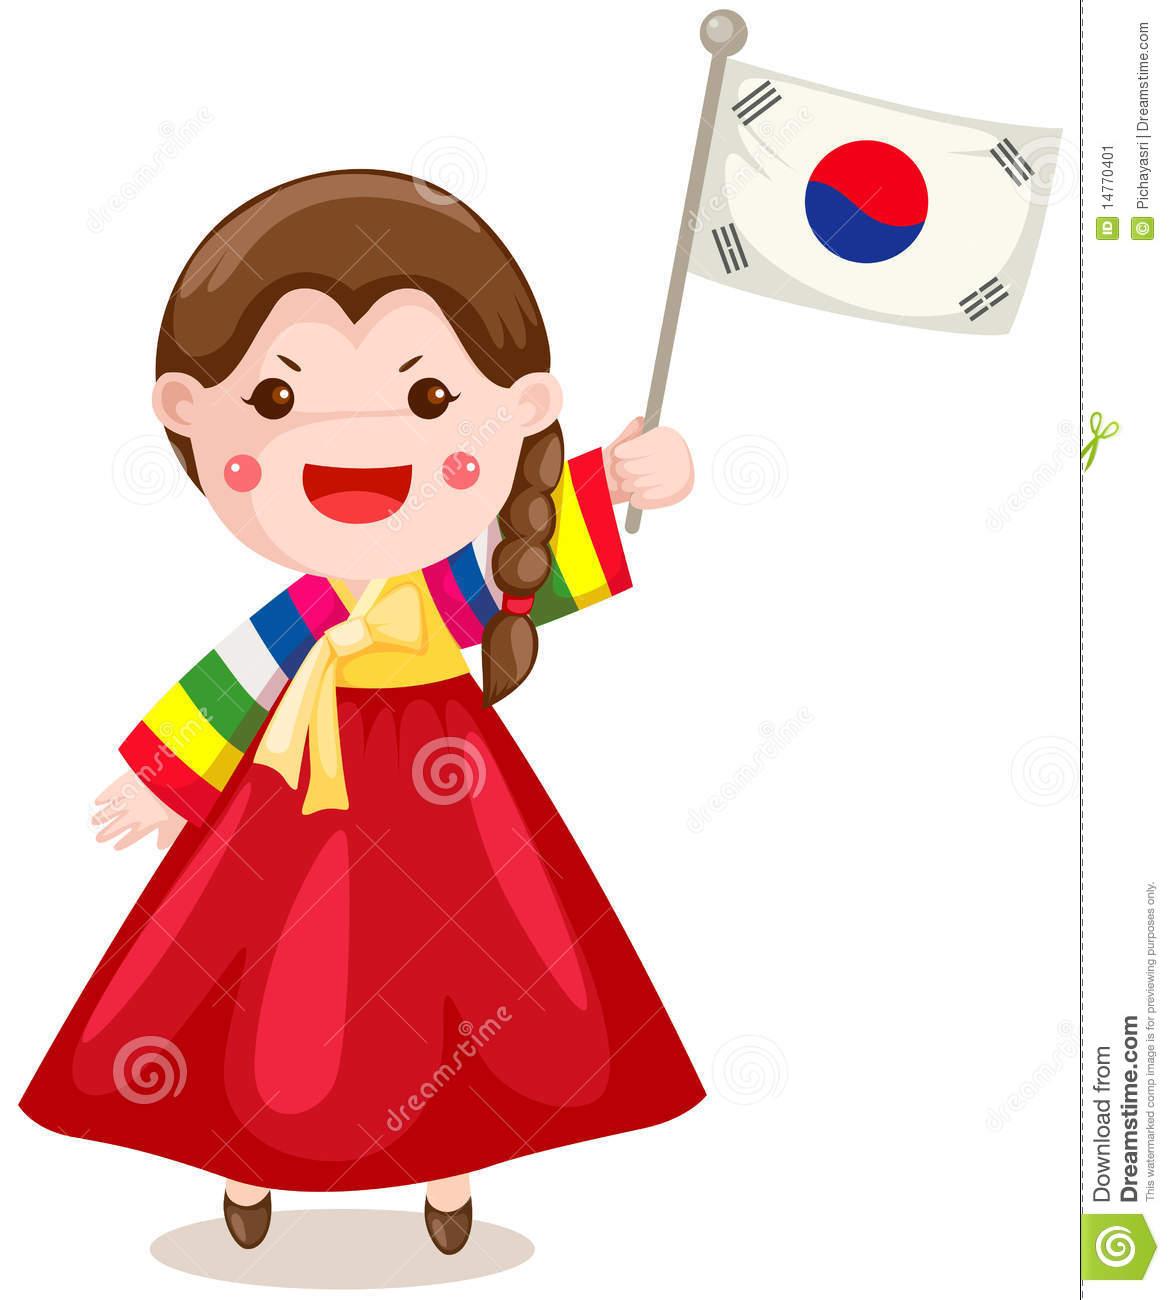 Traditional Costume clipart cute korean Korean Cute cliparts Korean Clipart